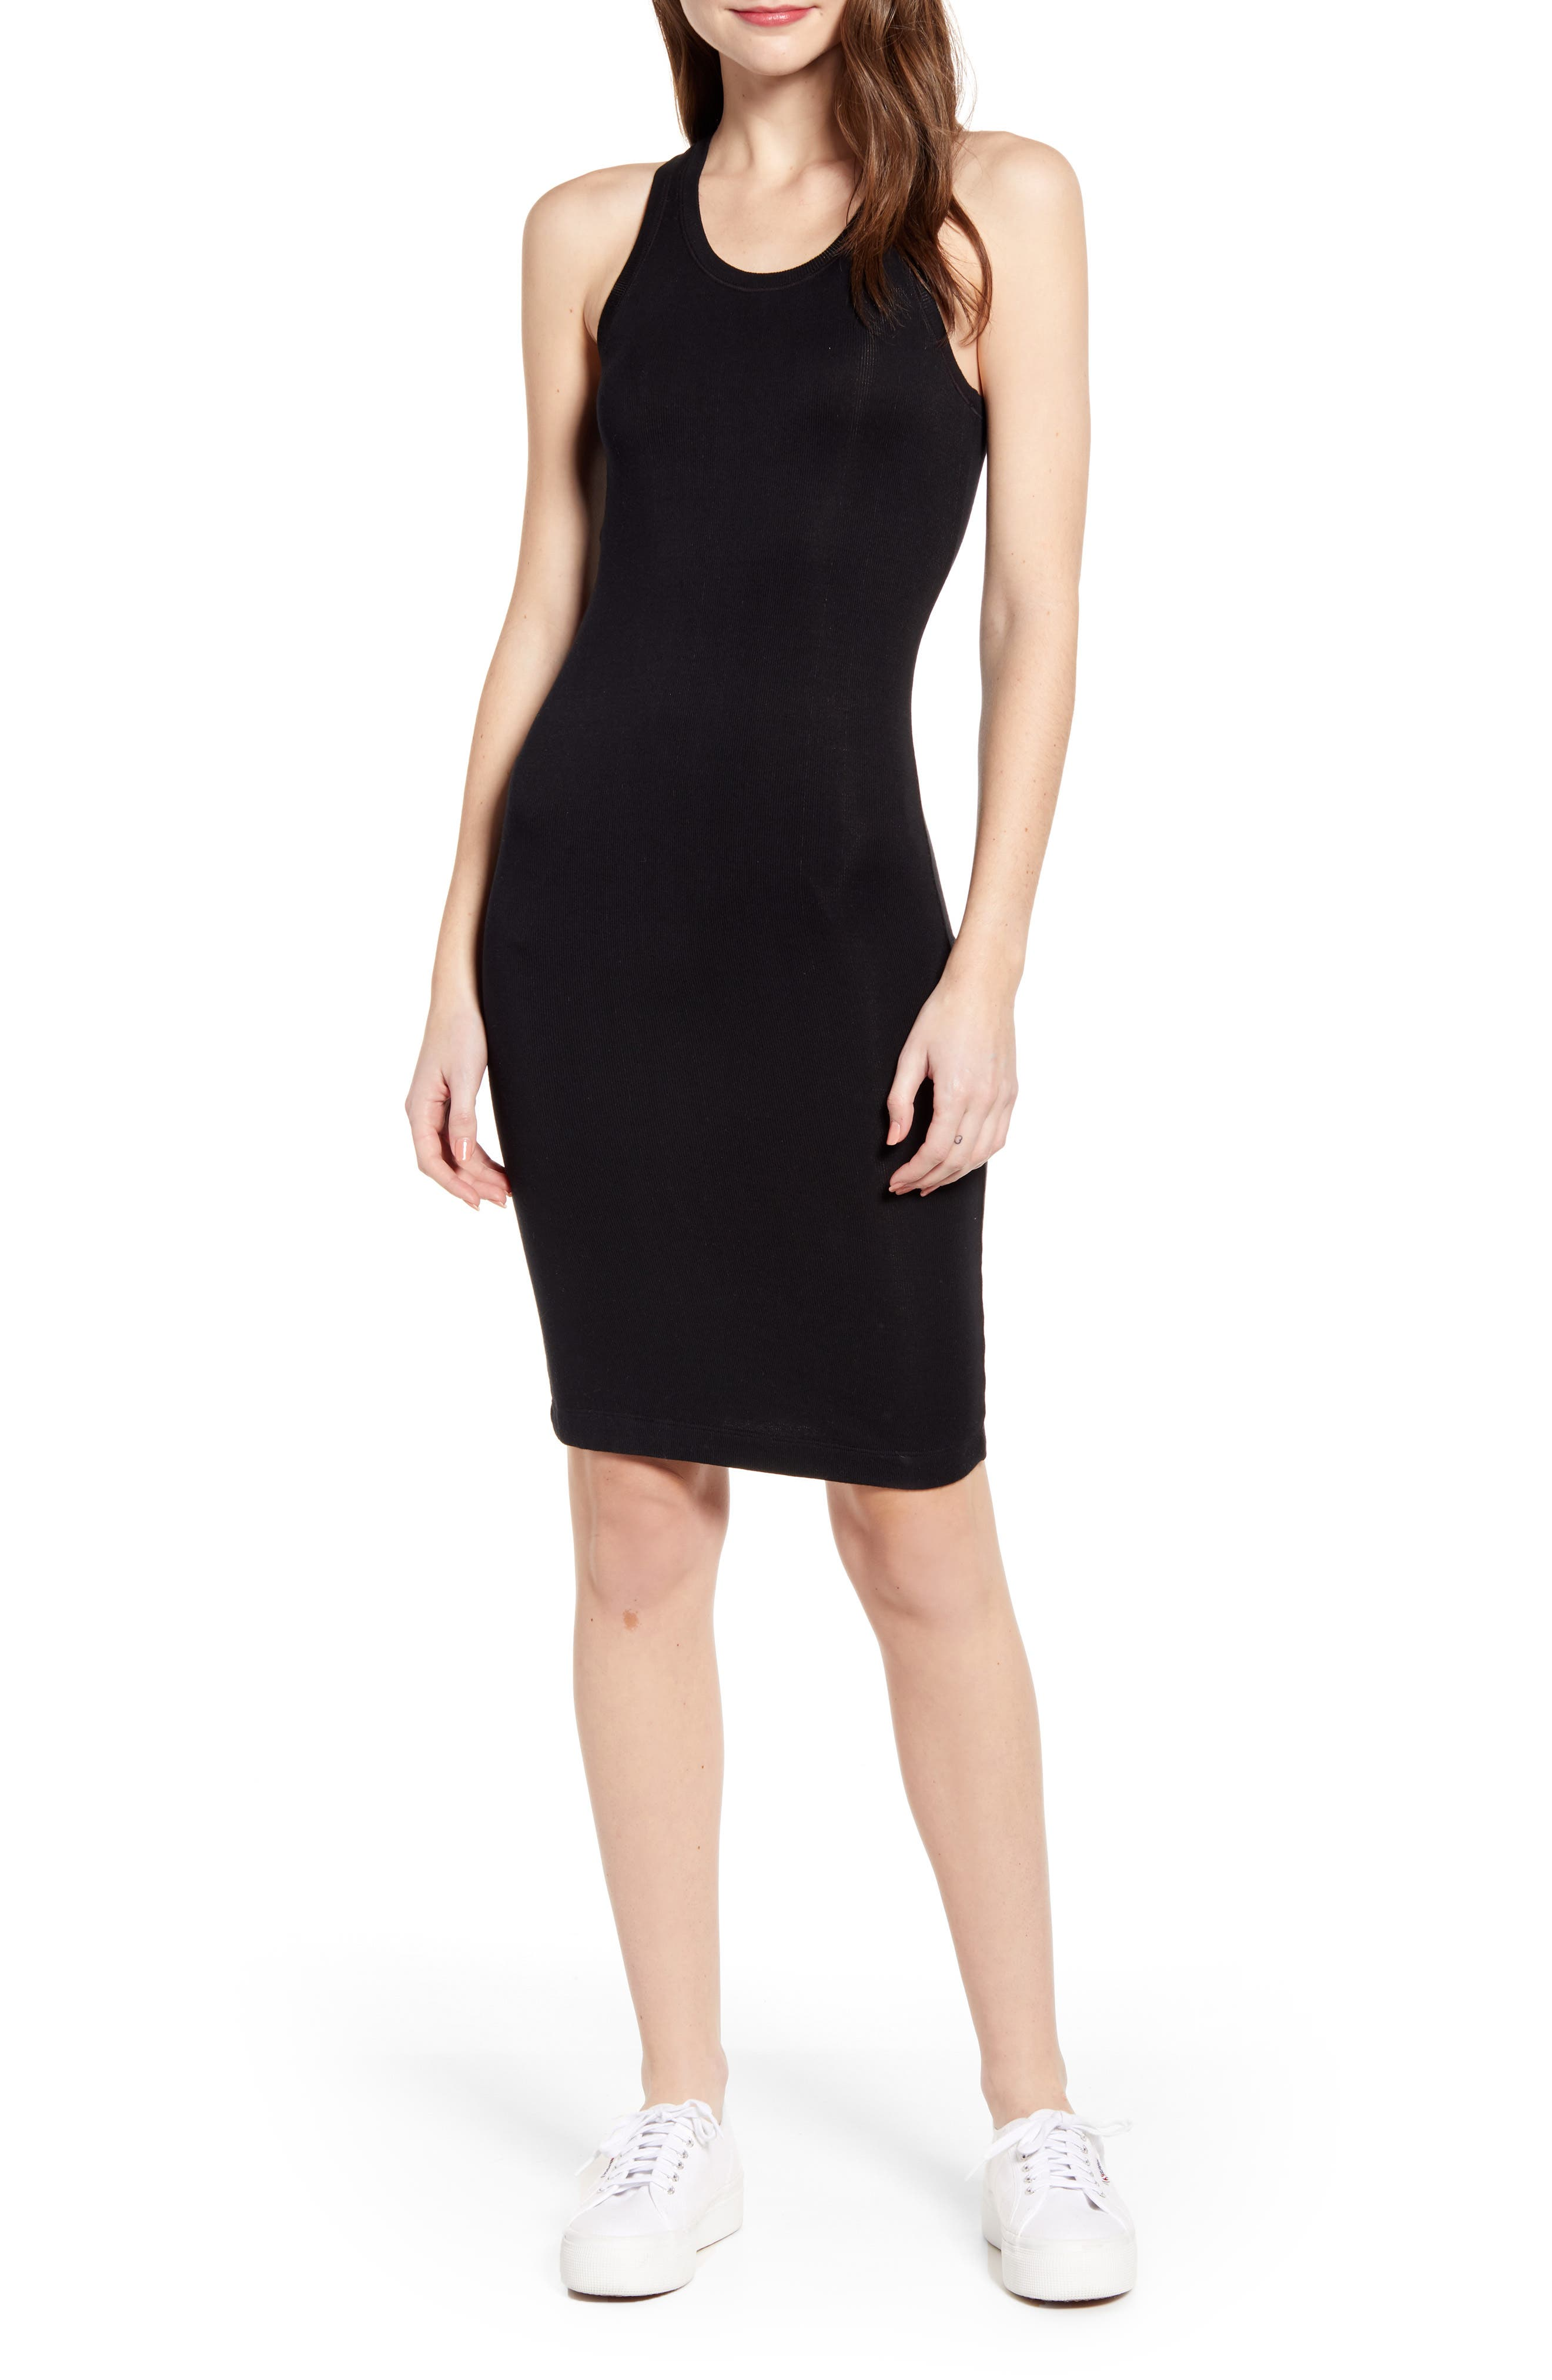 SPLENDID Racerback Knit Dress, Main, color, BLACK